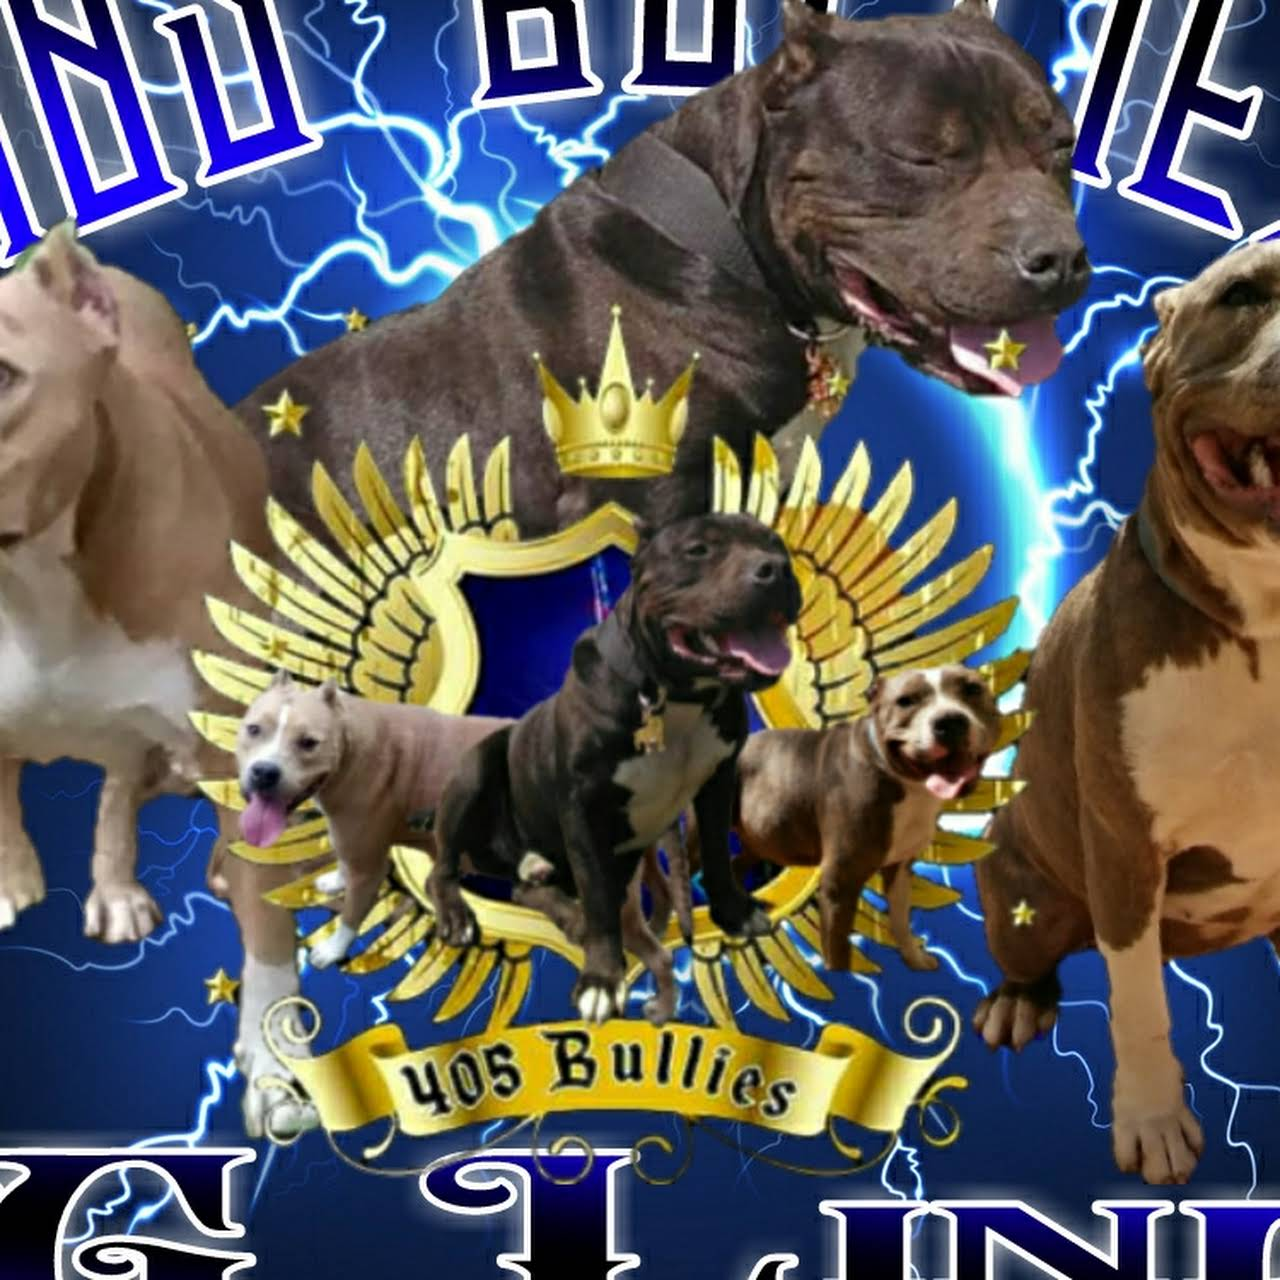 405 Bullies Kennels - American Bully Breeder in Oklahoma City